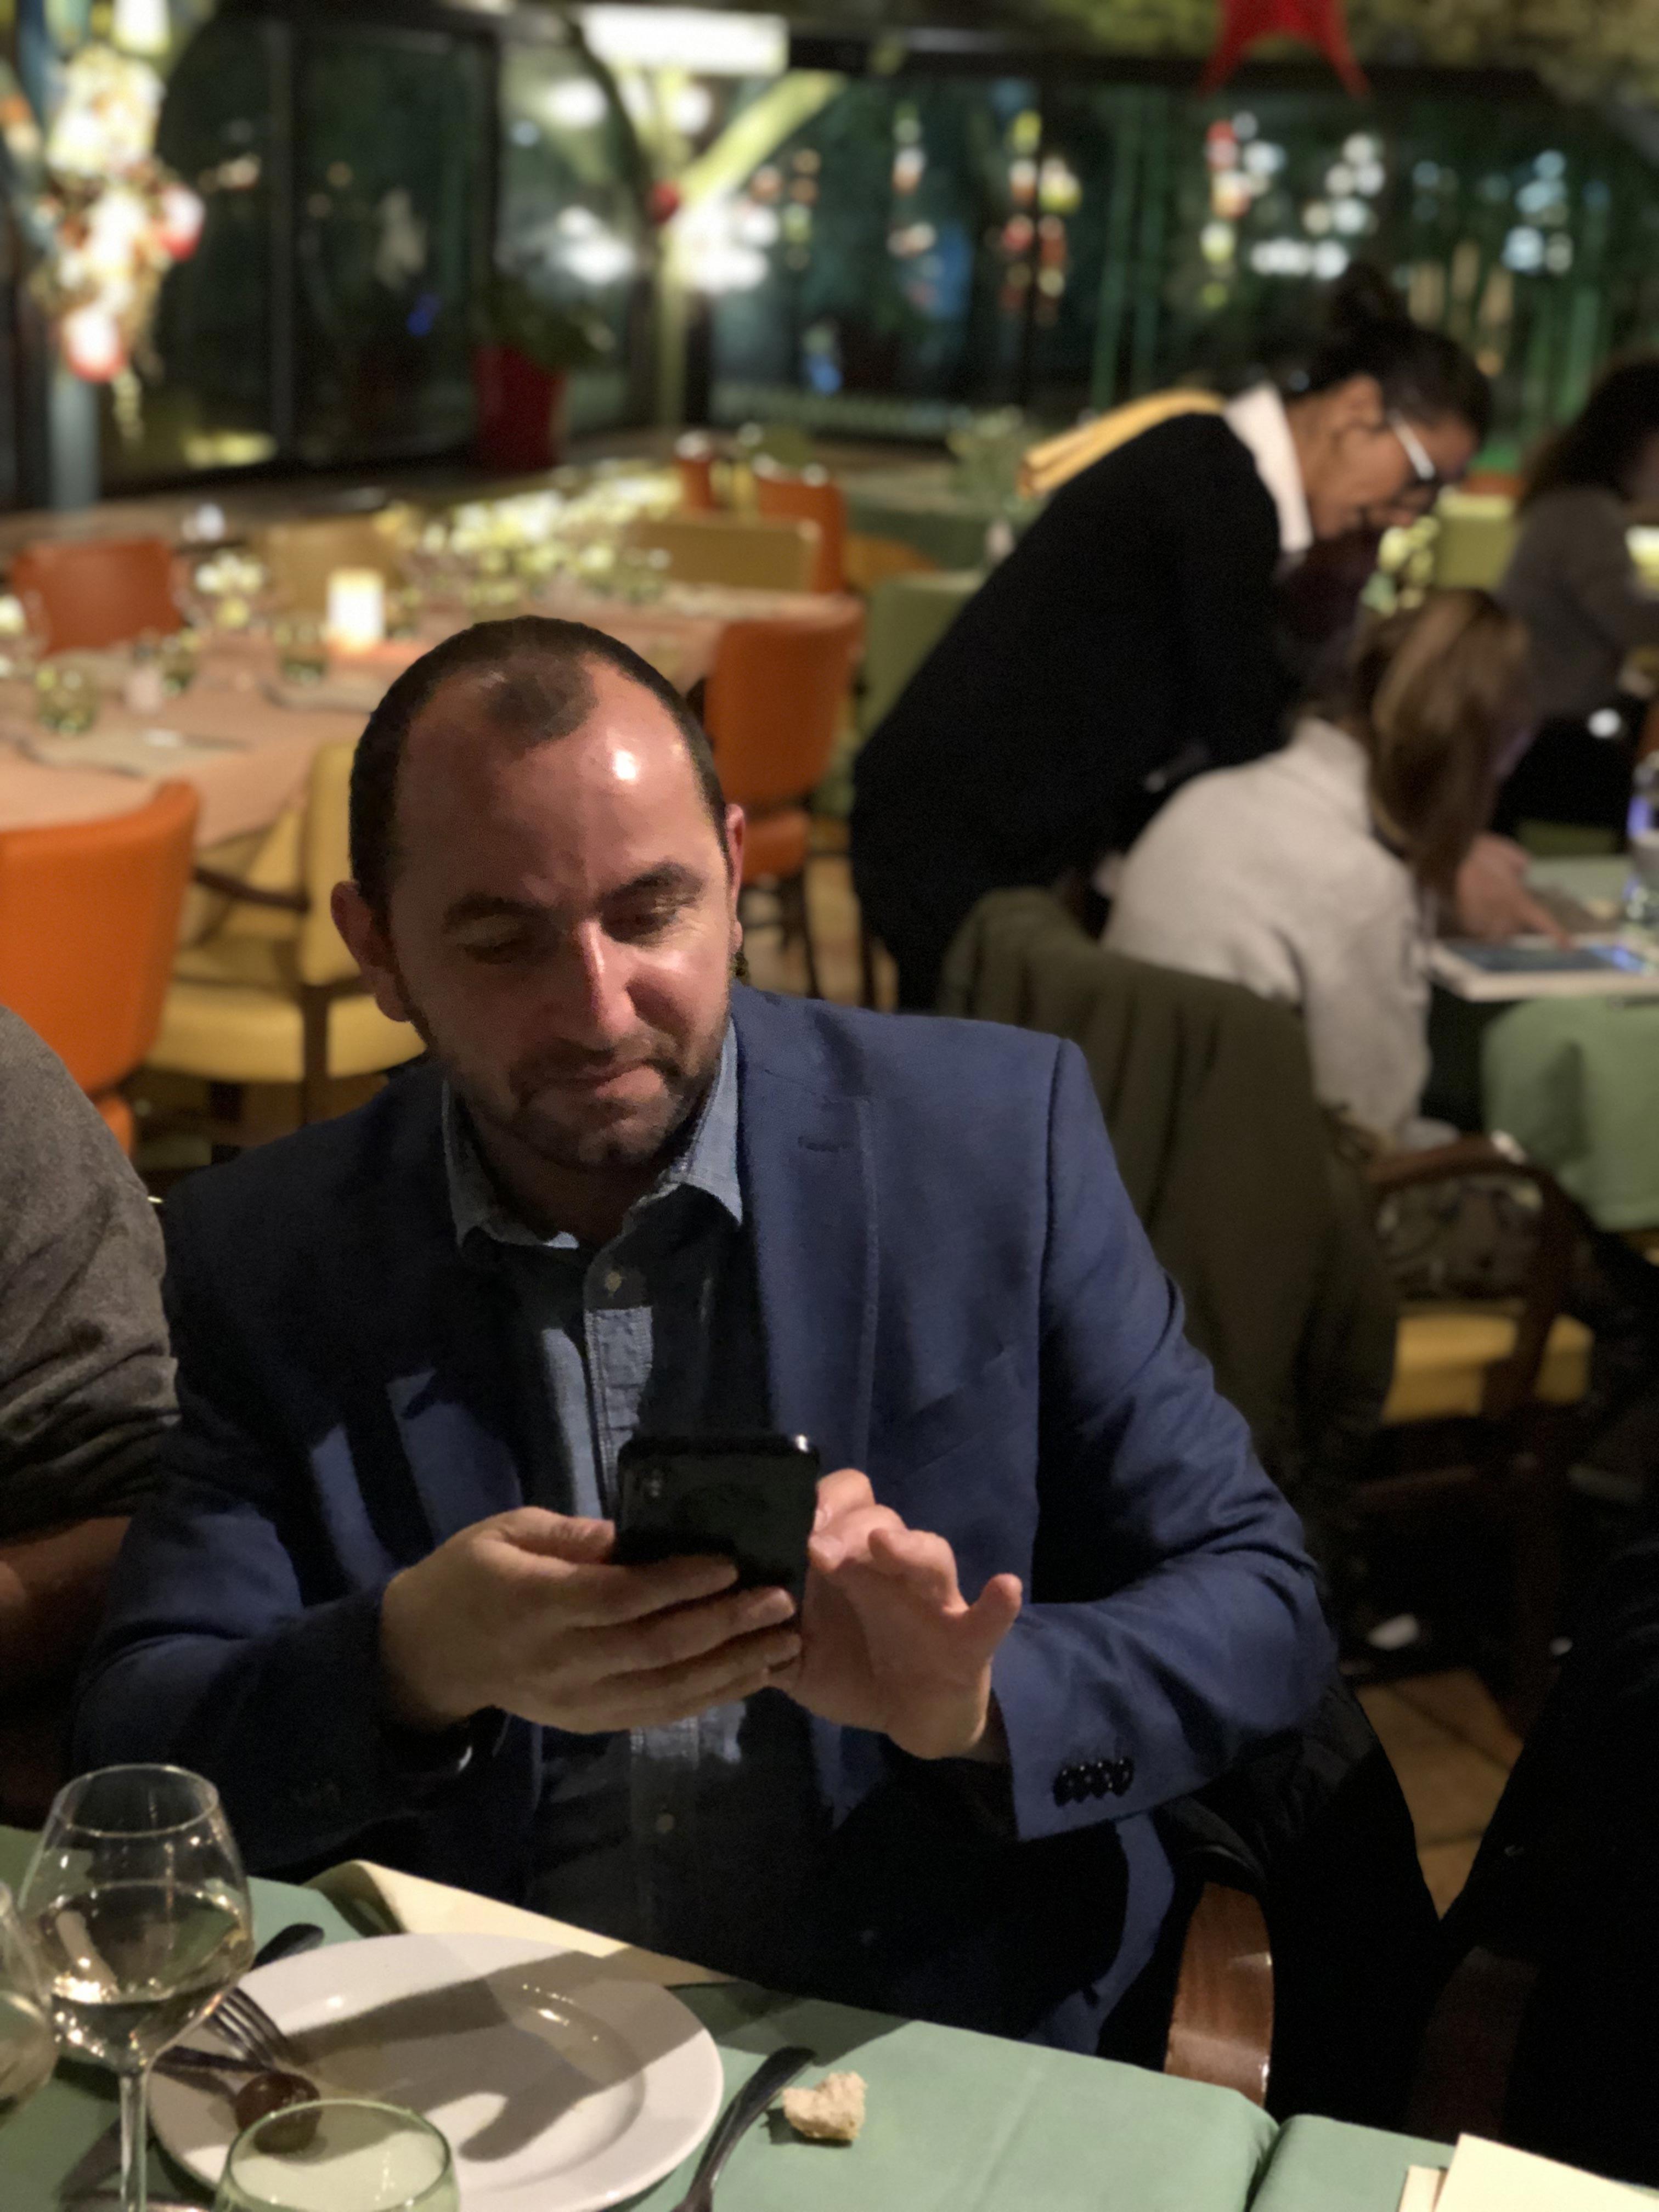 Repas-de-fin-d'année-marseille-nice-paris-noel-audiovisuel-event-evenement-evenementiel-communication-equipe-team-aucop